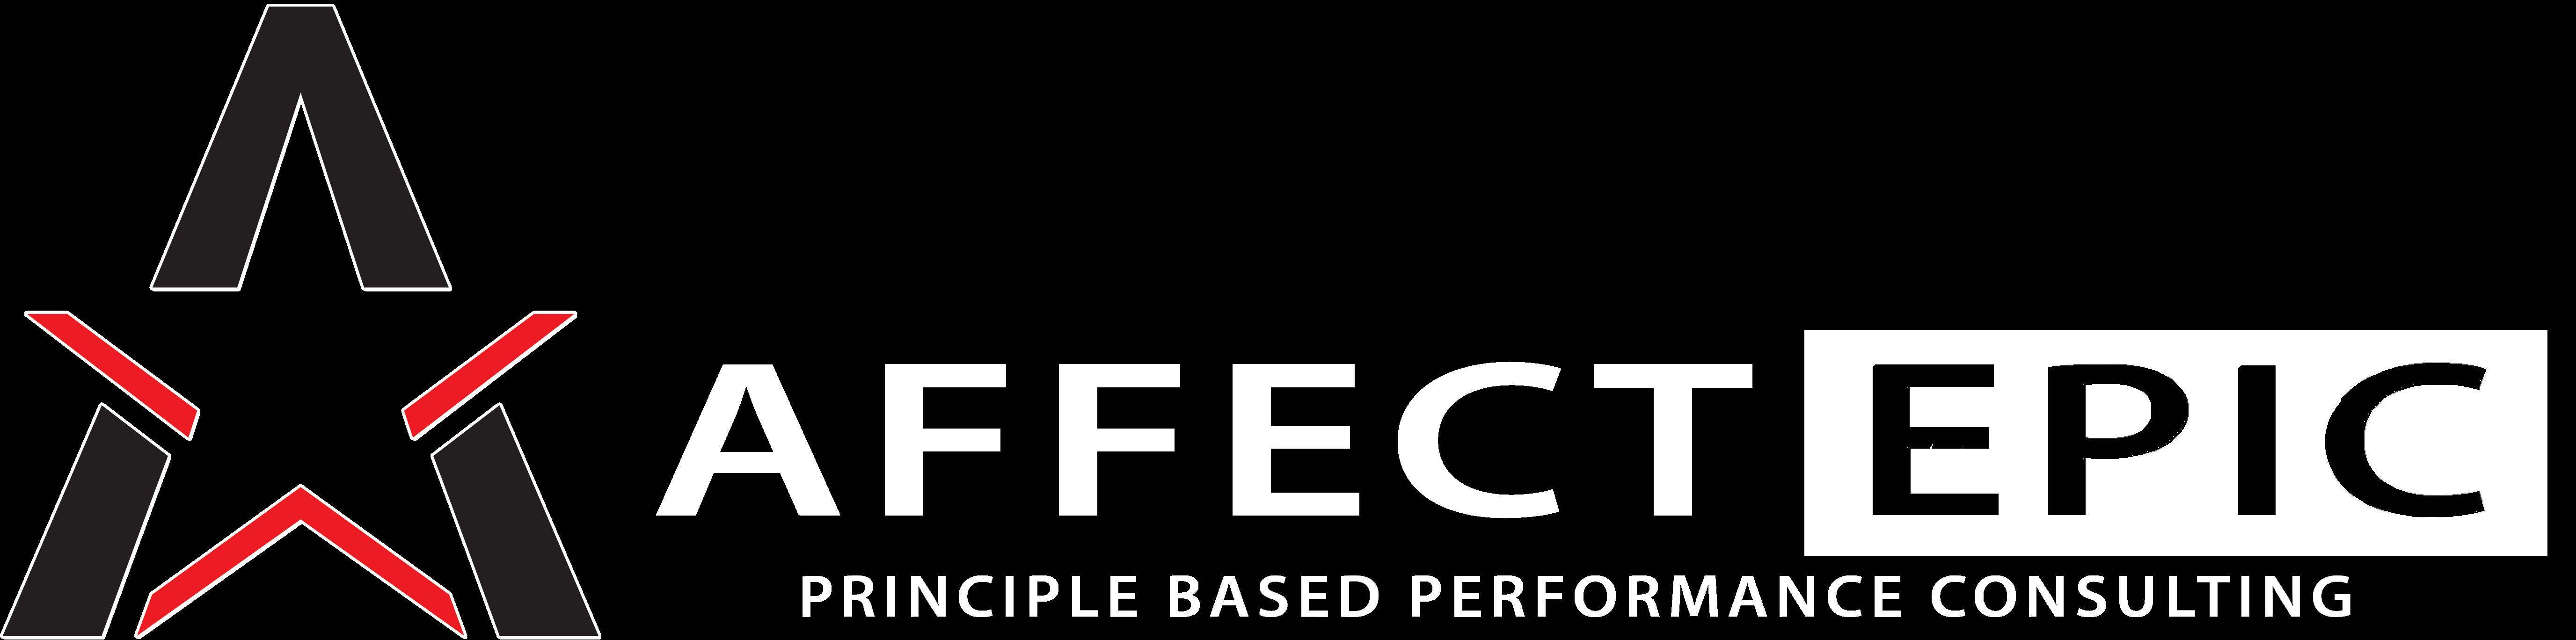 AFFECT EPIC